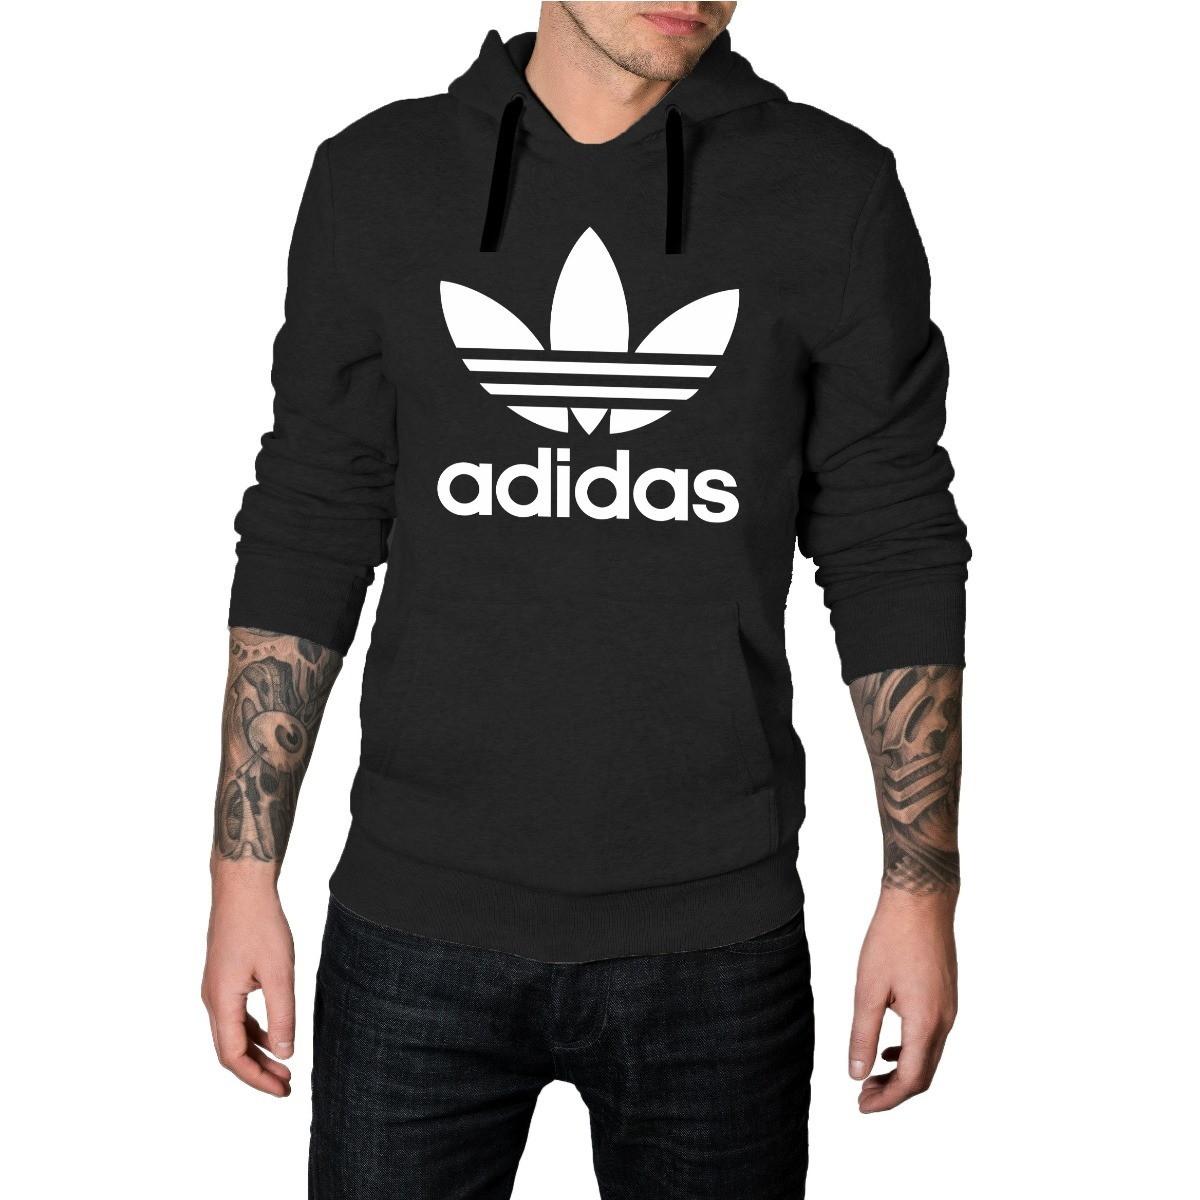 Blusa Adidas Jamaica  feb4c2a17b4b1